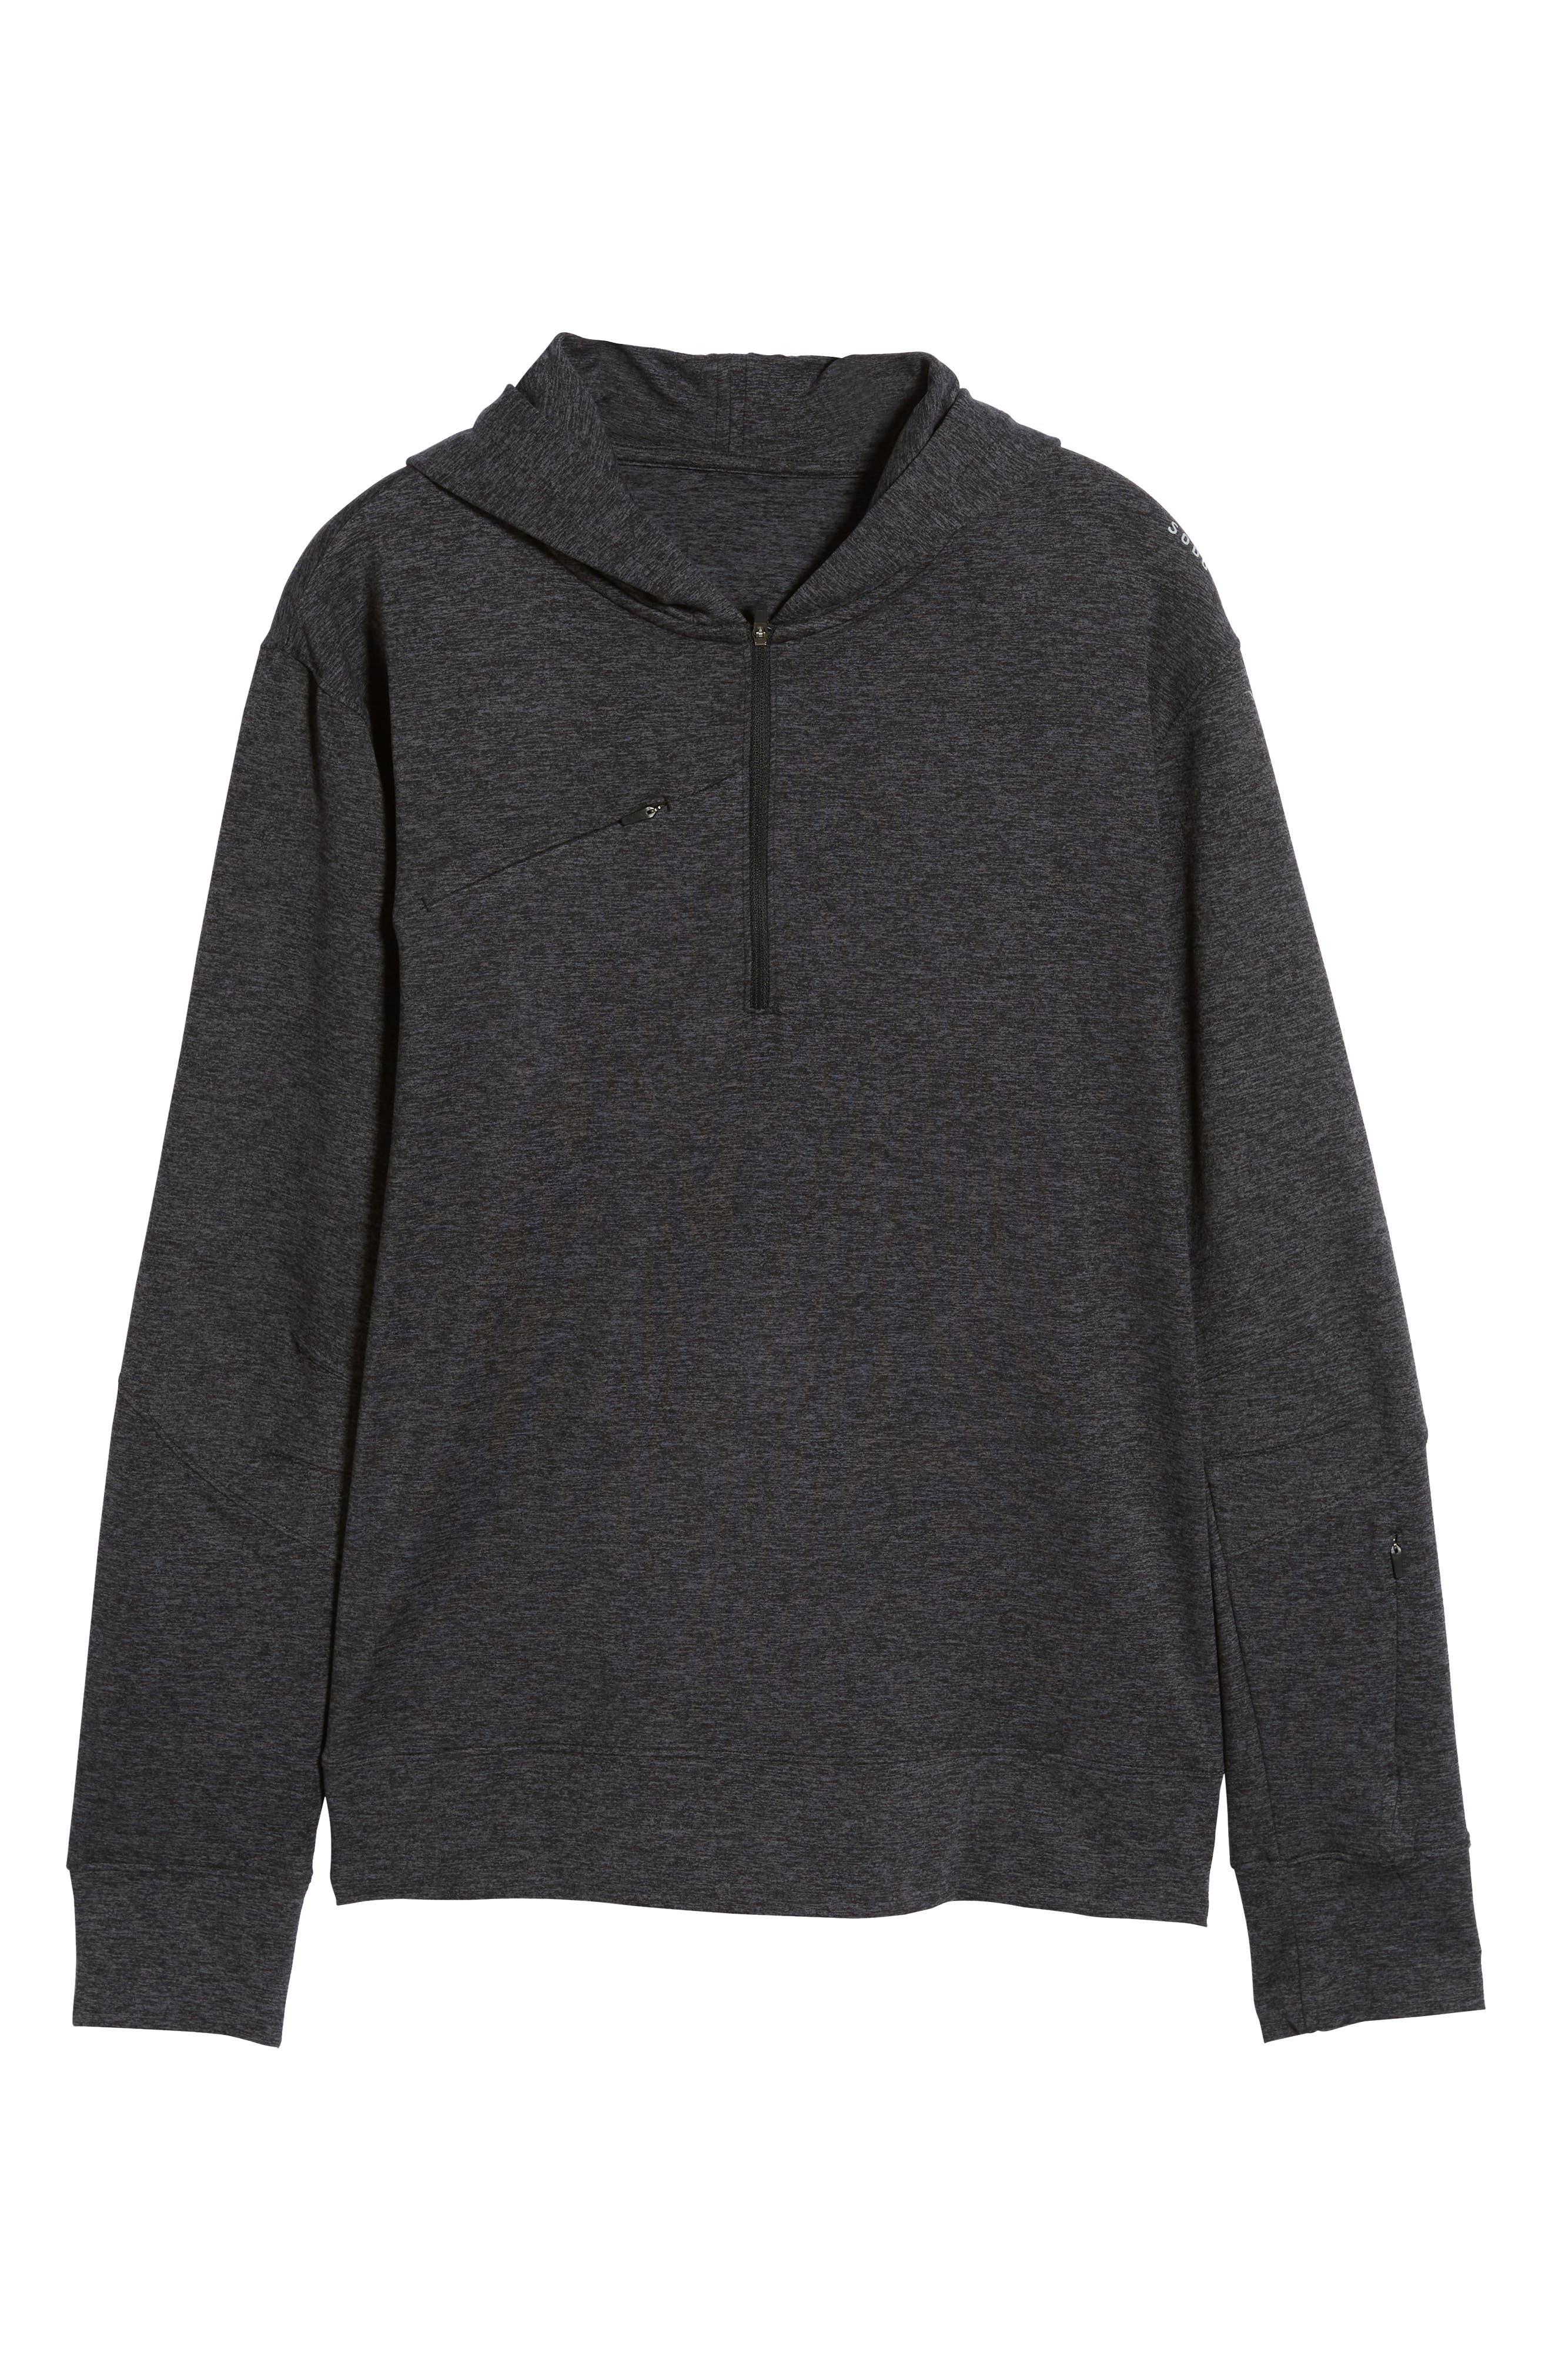 SODO, Elevate Hooded Sweatshirt, Alternate thumbnail 6, color, HEATHER CHARCOAL BLACK/ BLACK